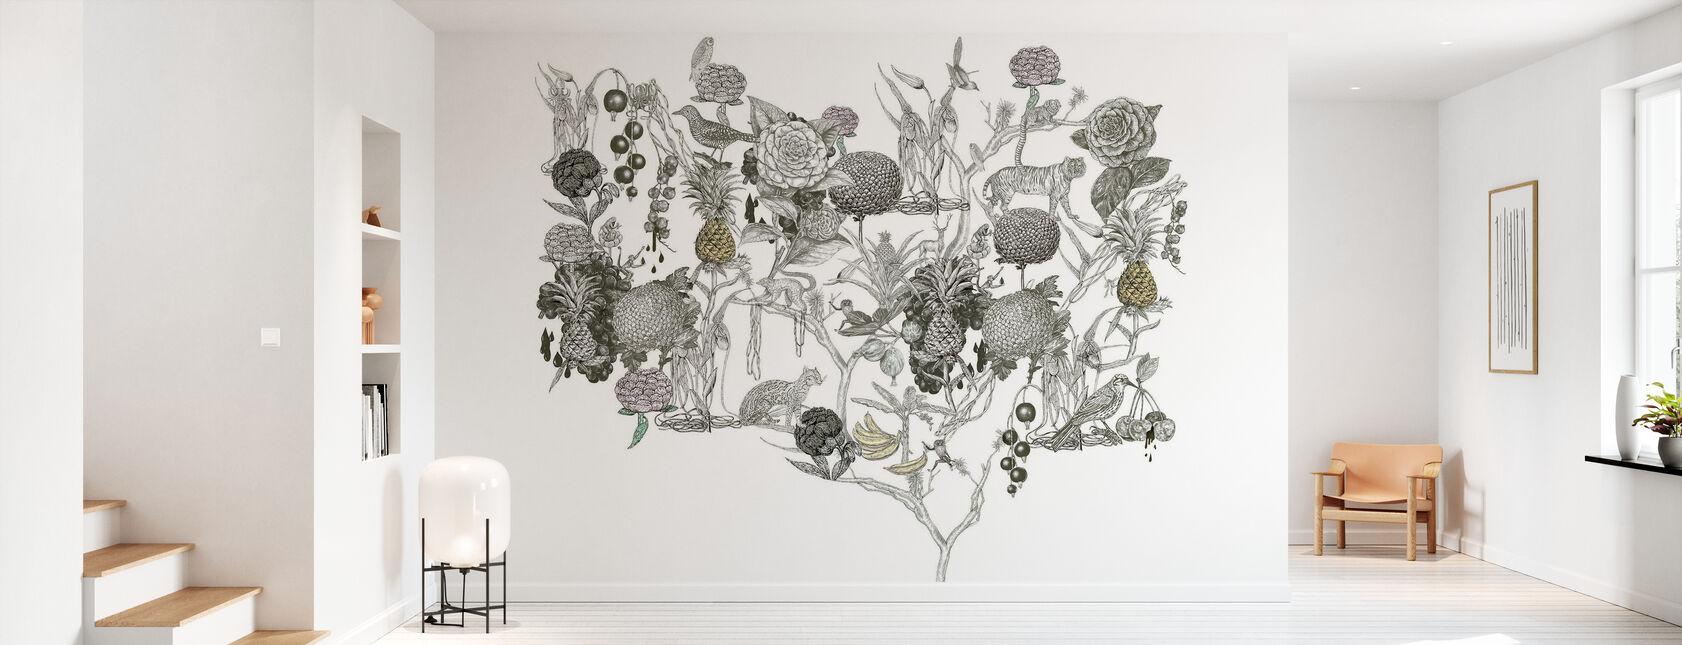 Wild at Heart 4 - Wallpaper - Hallway